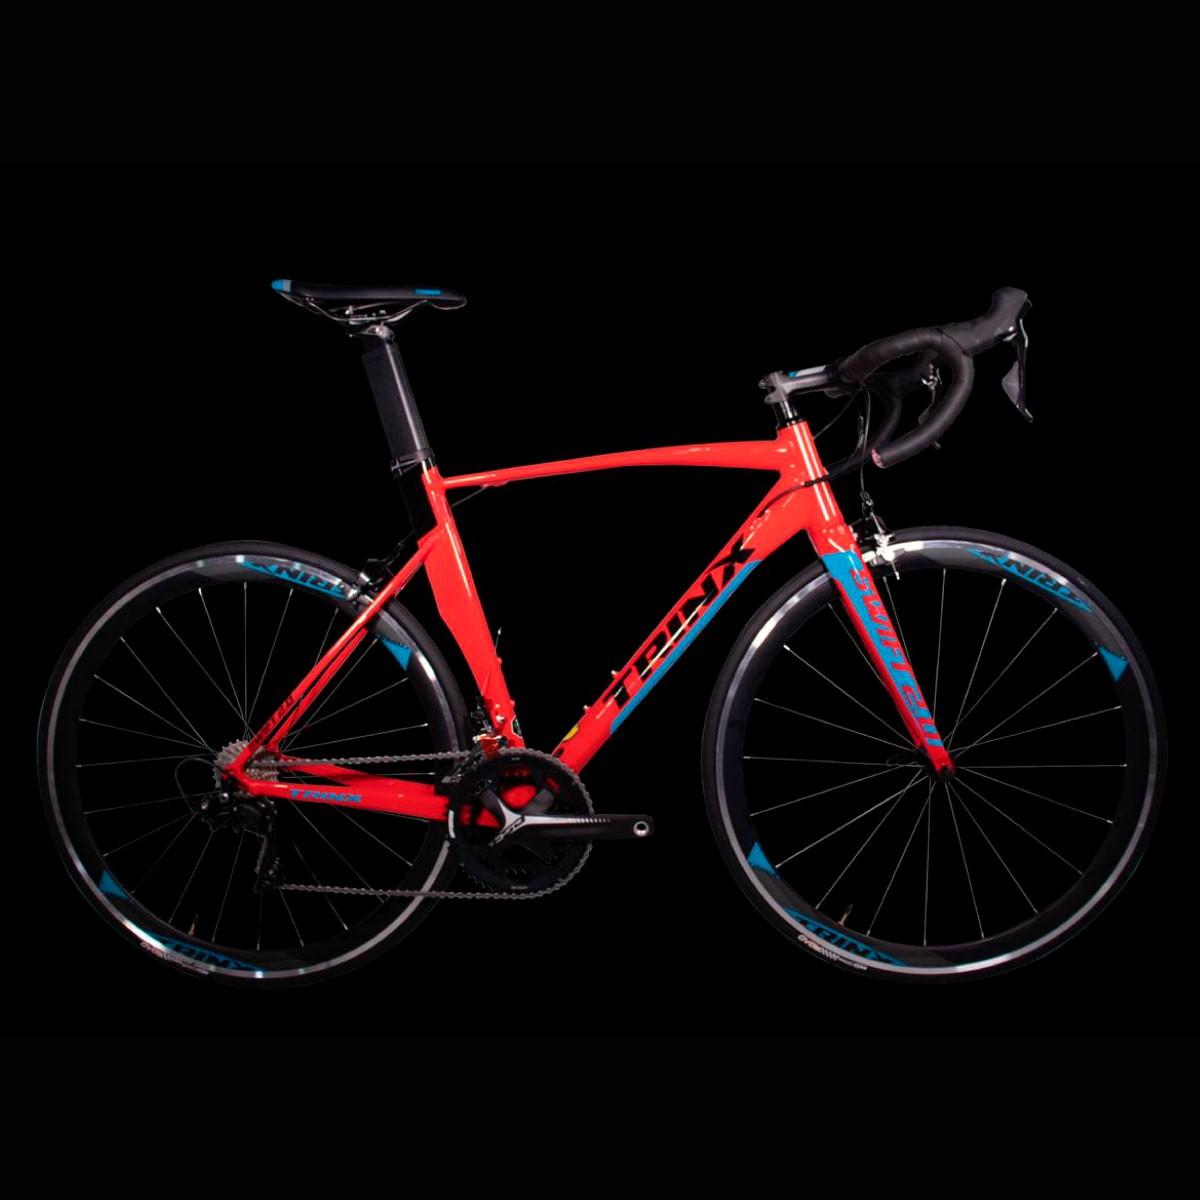 Bike Trinx Swft 2.0 2020 22v Shimano Vermelho Azul